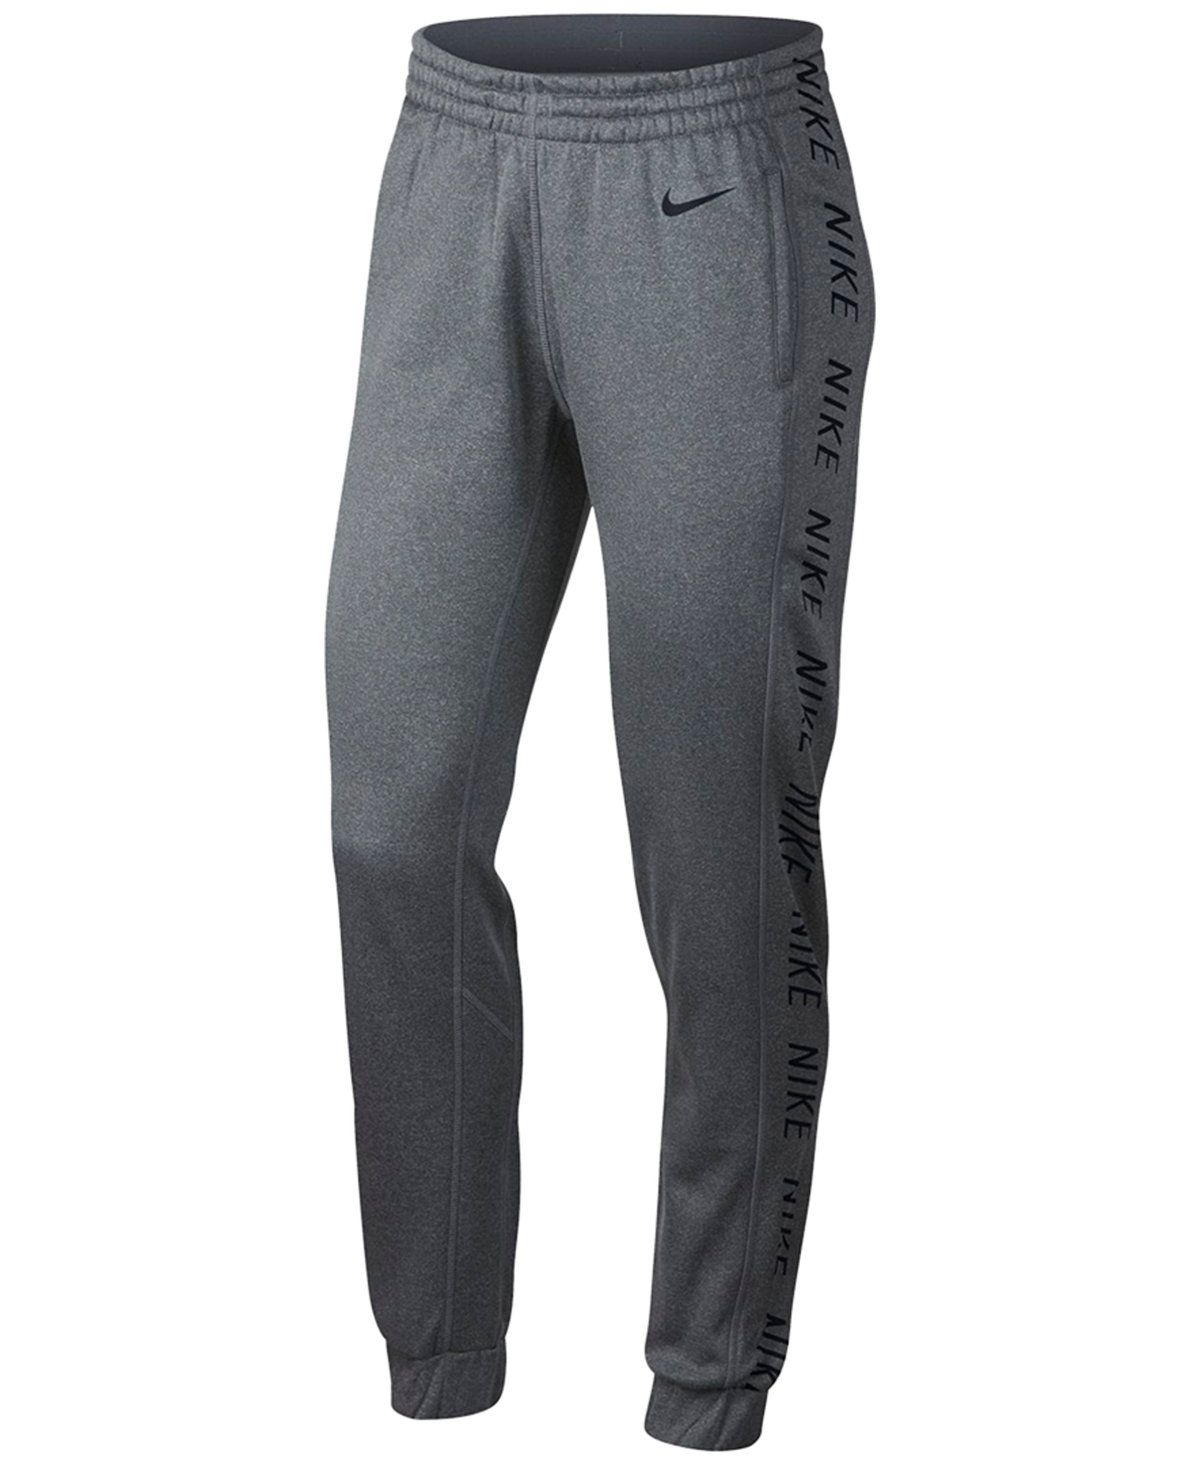 e157e7bd42 Nike Therma Tapered Training Pants - Pants - Women - Macy s ...